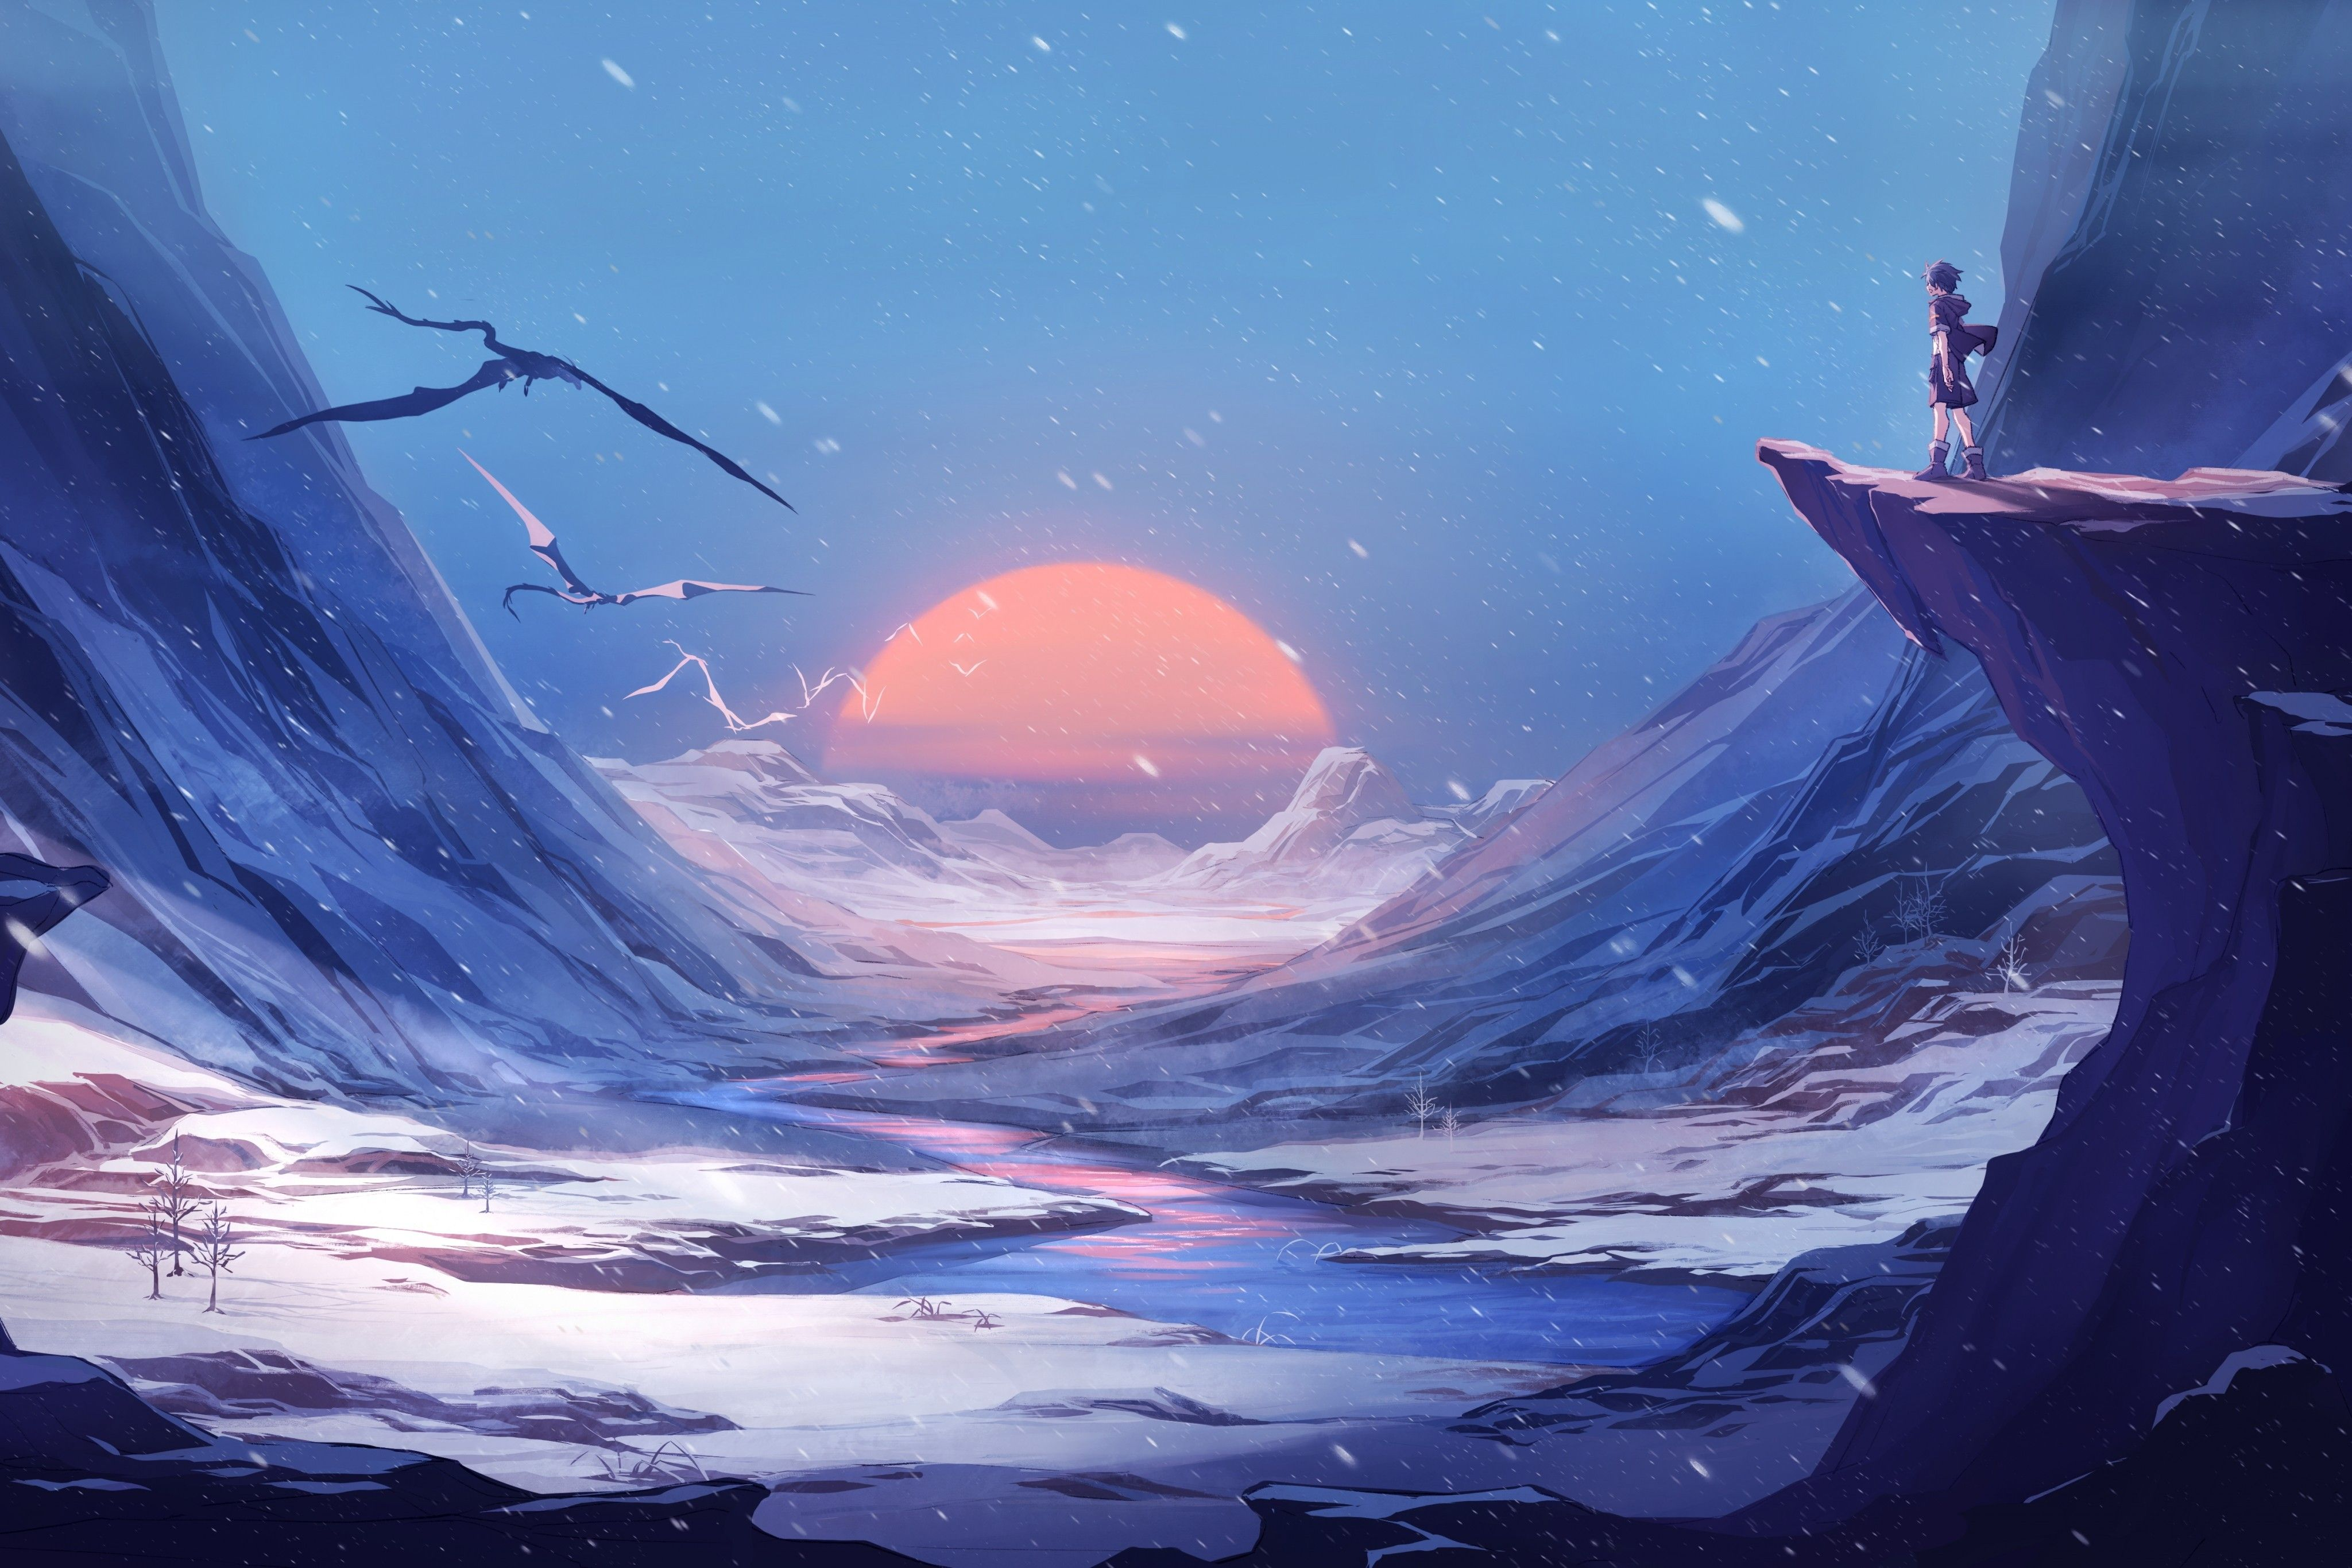 8+ 8K Anime Landscape Wallpaper Background